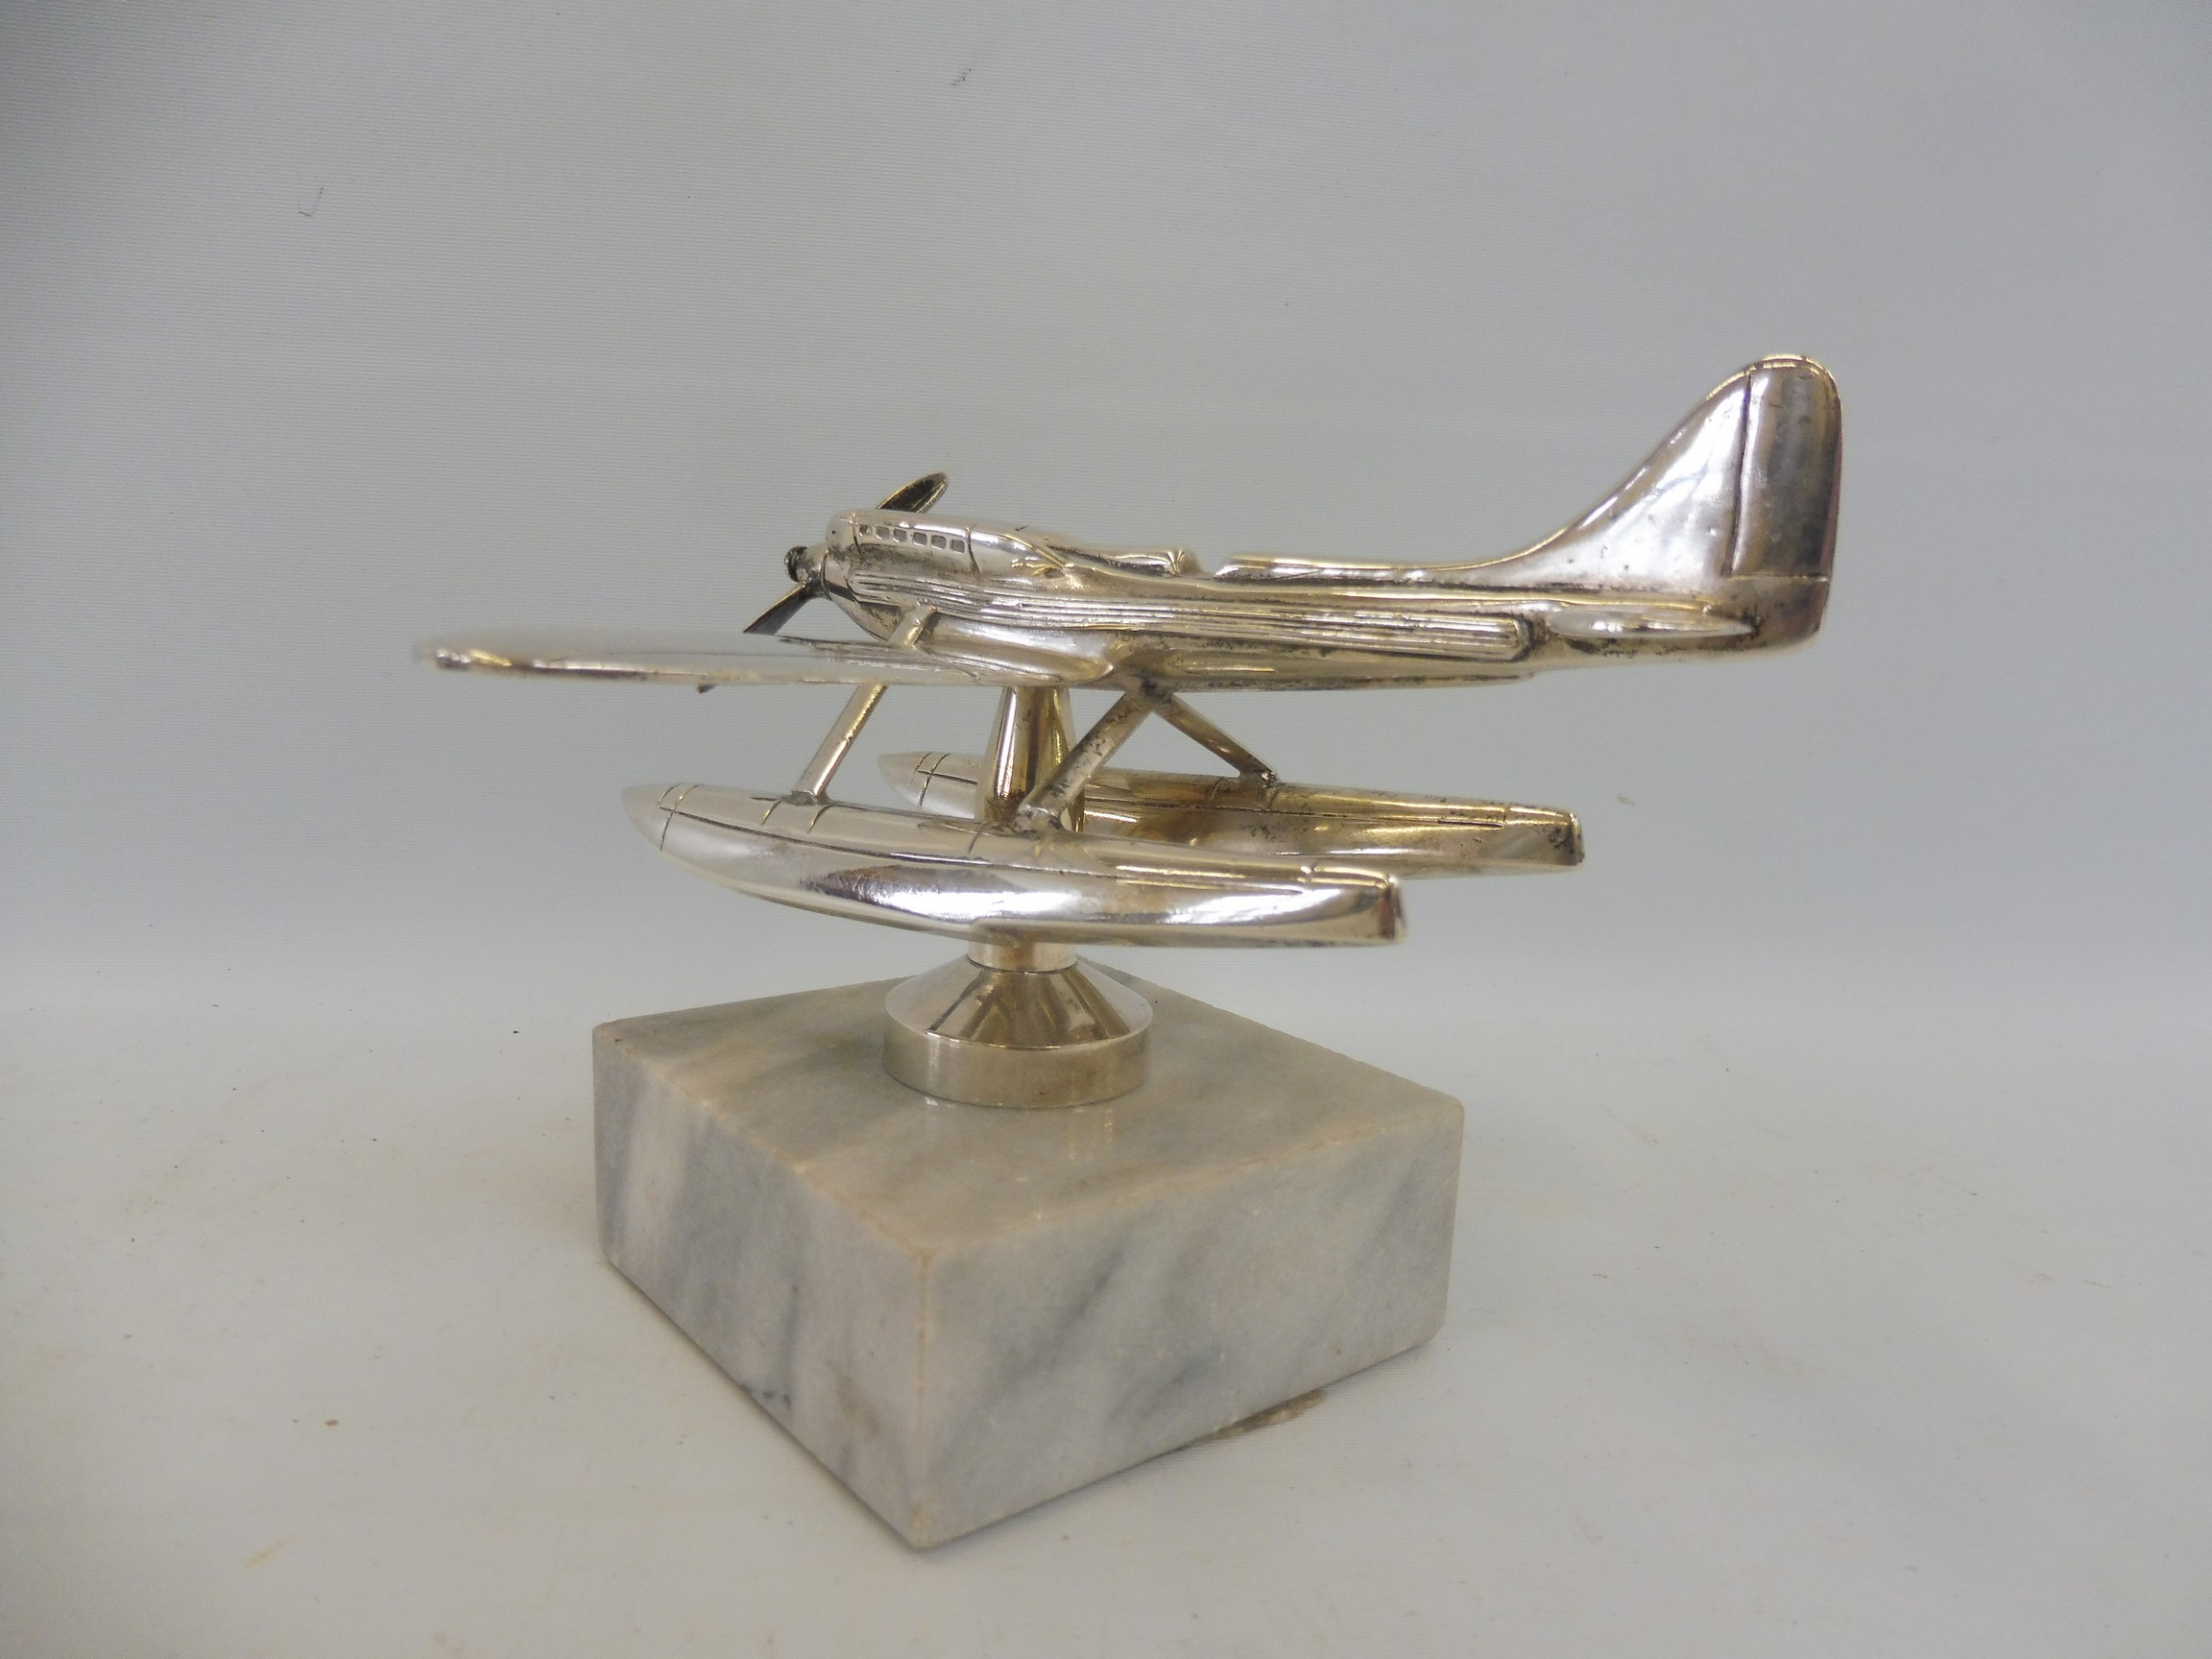 A Schneider Trophy seaplane supermarine mascot, nickel plated, inscribed 'Rolls-Royce' under one - Image 3 of 6